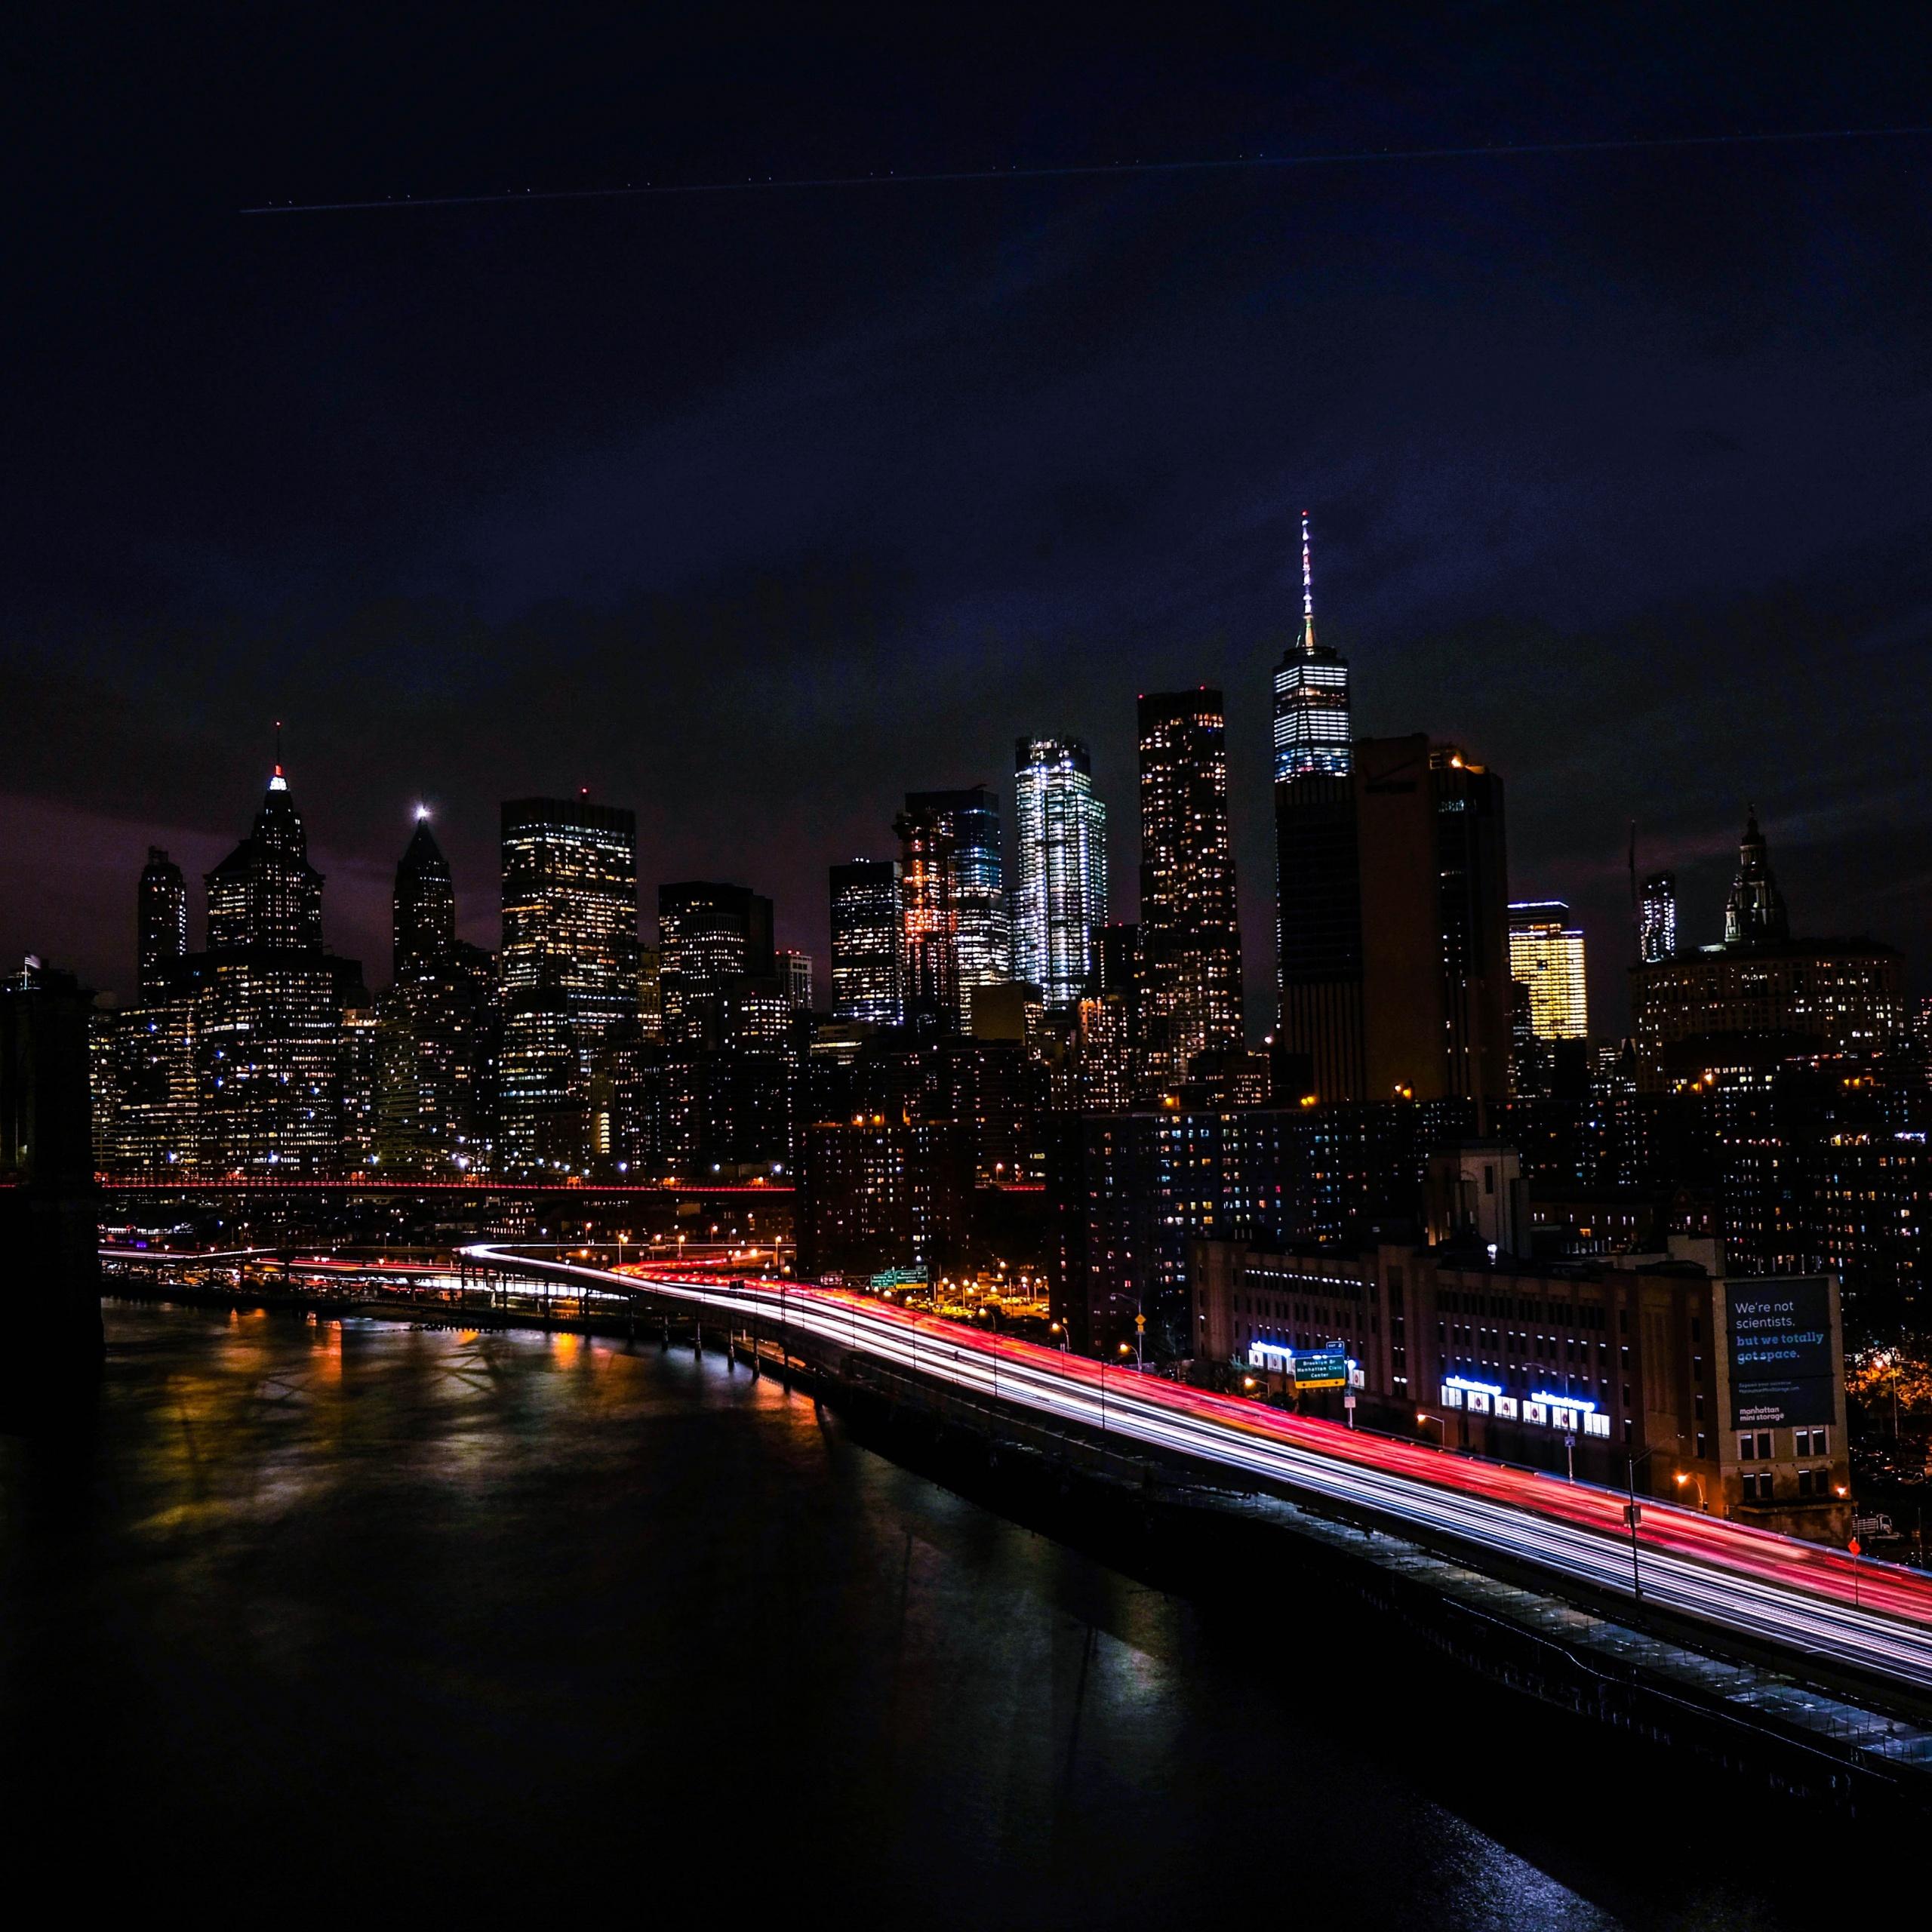 New York City 4K Wallpaper, Night, Cityscape, City Lights